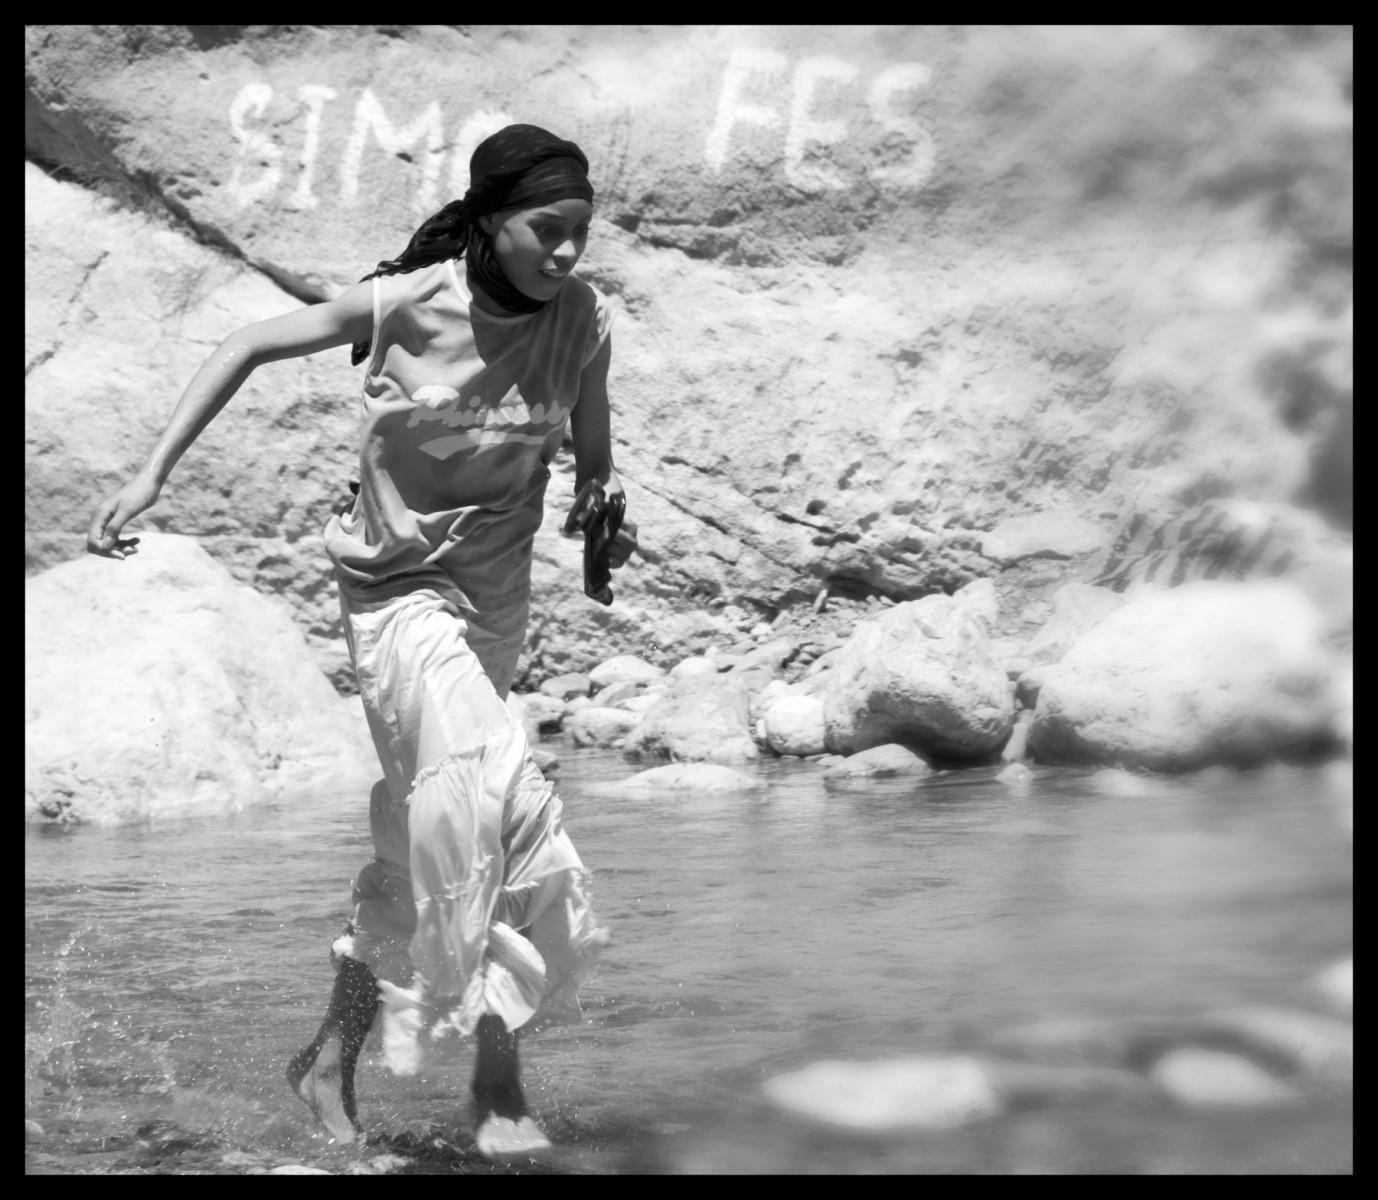 103618_DSC0078-water-play-1 Storie di Luce